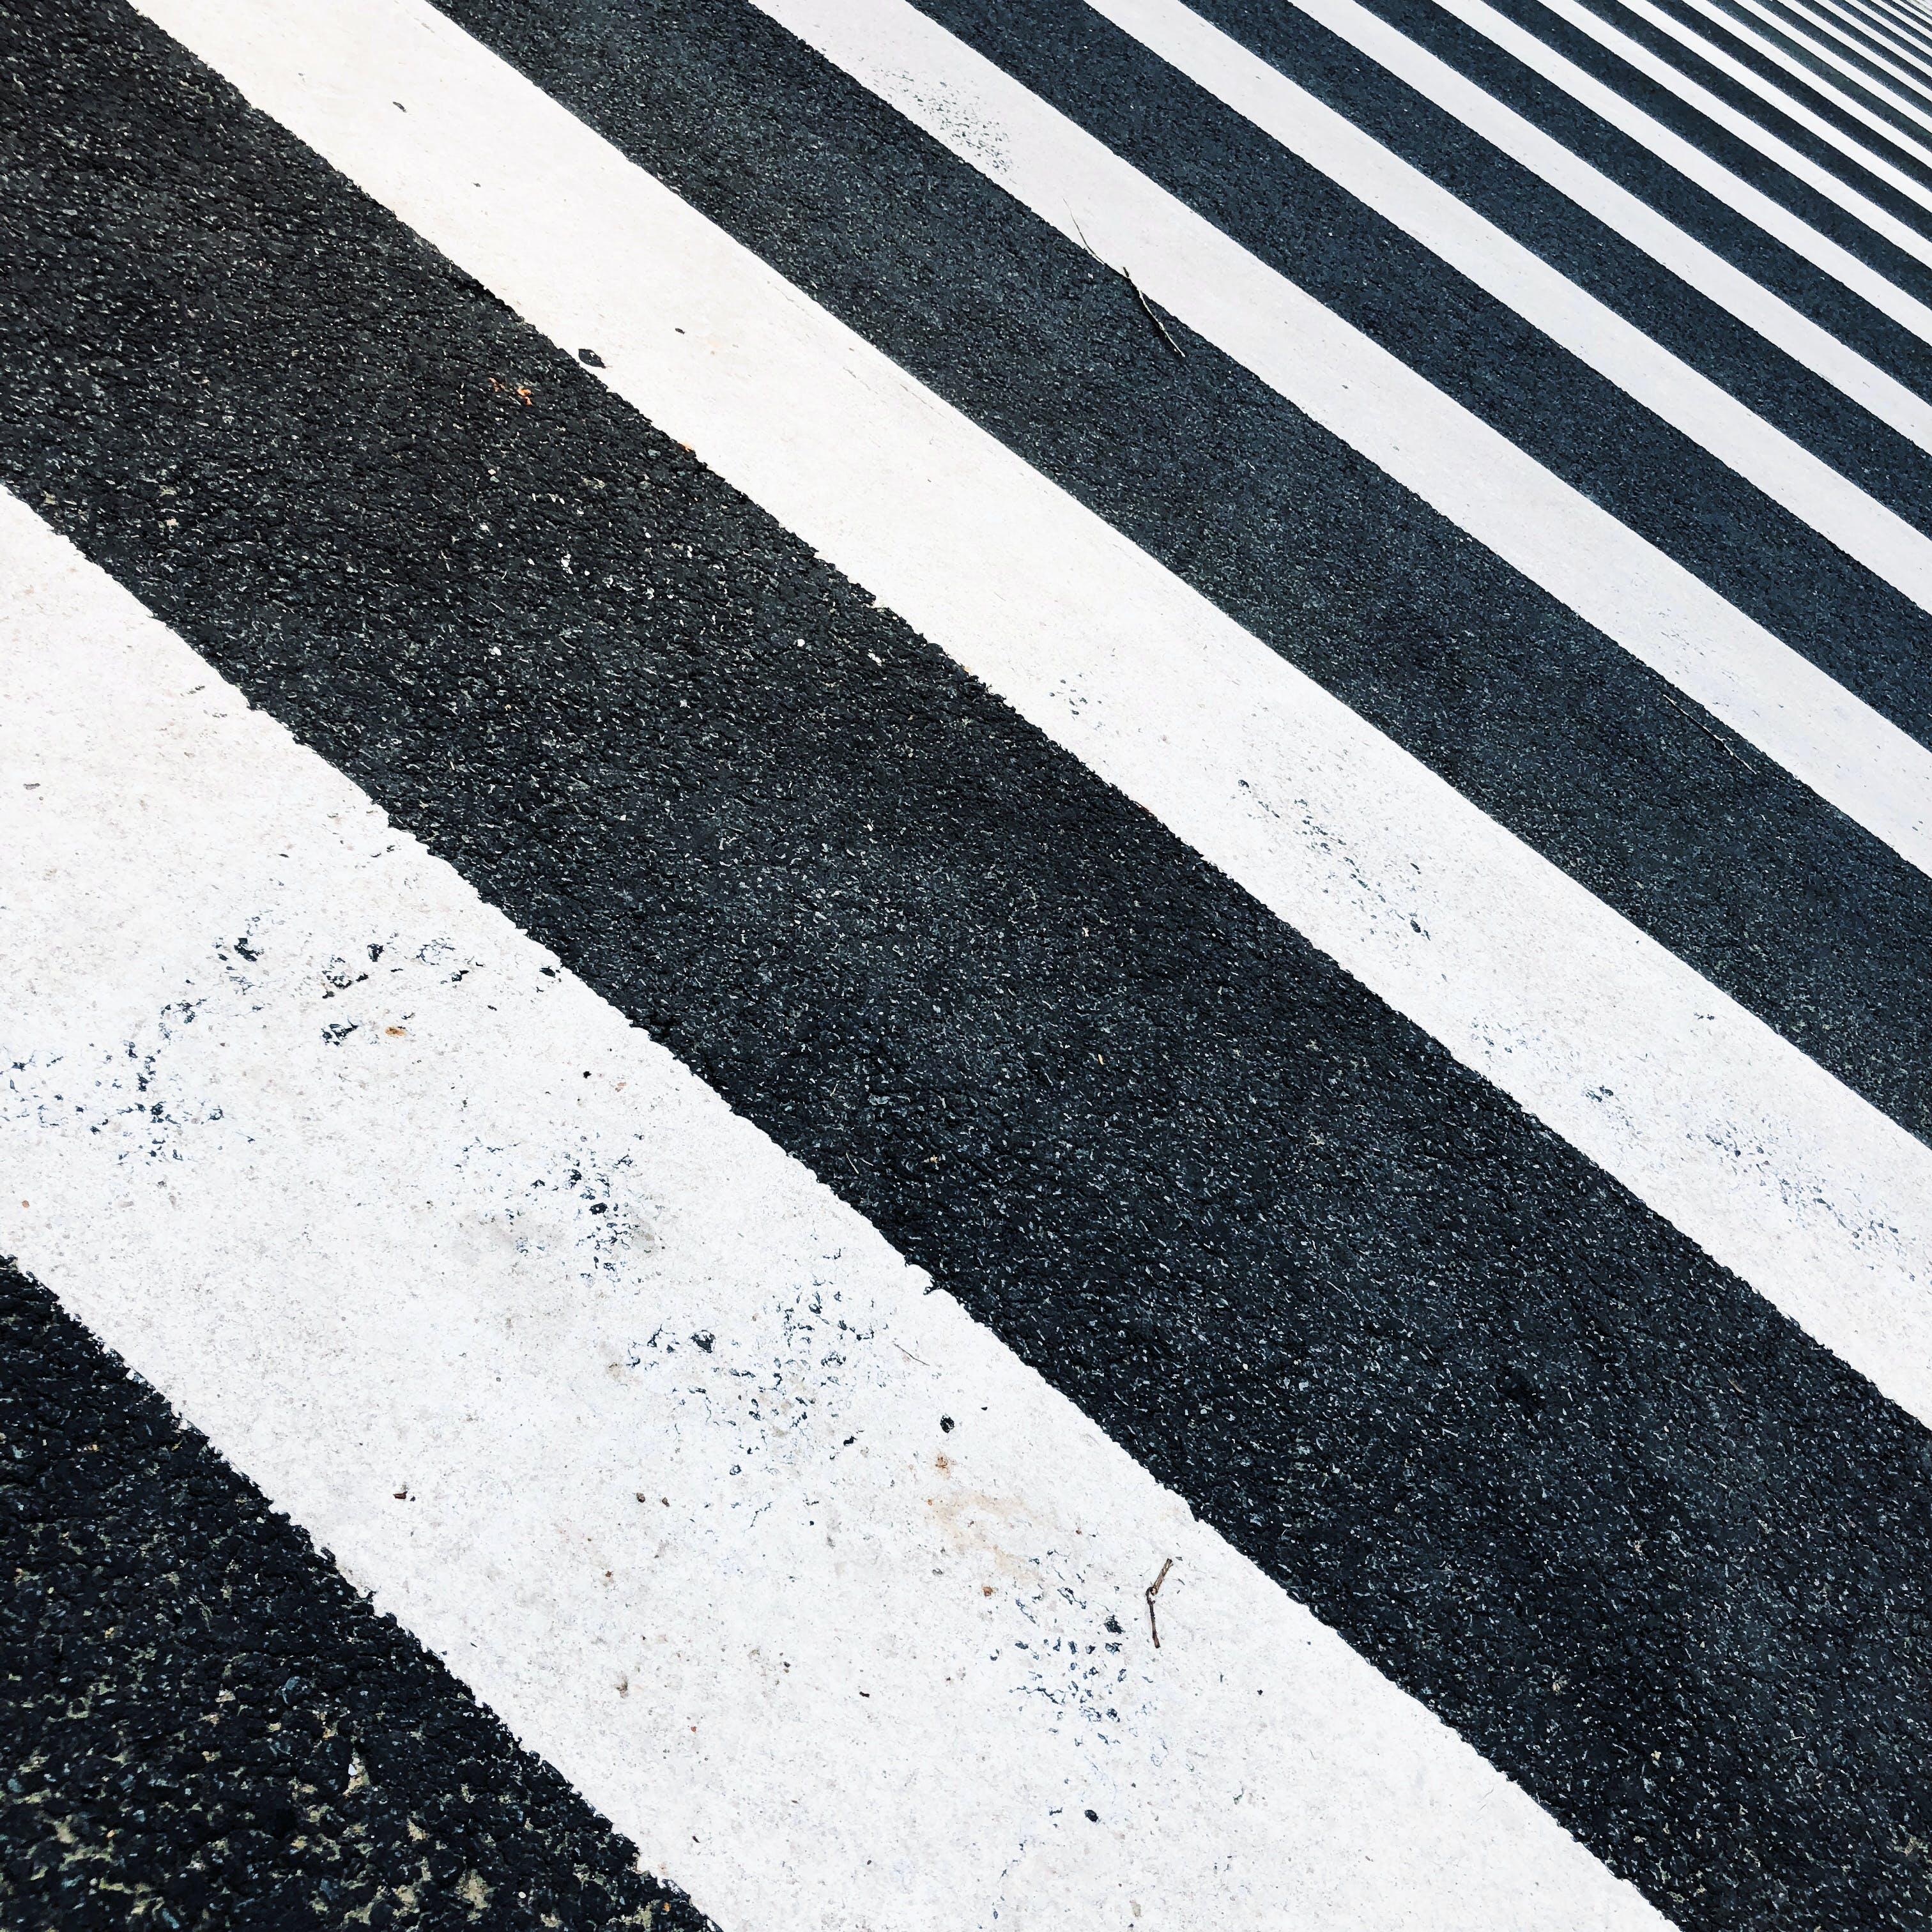 Pedestrian Lane